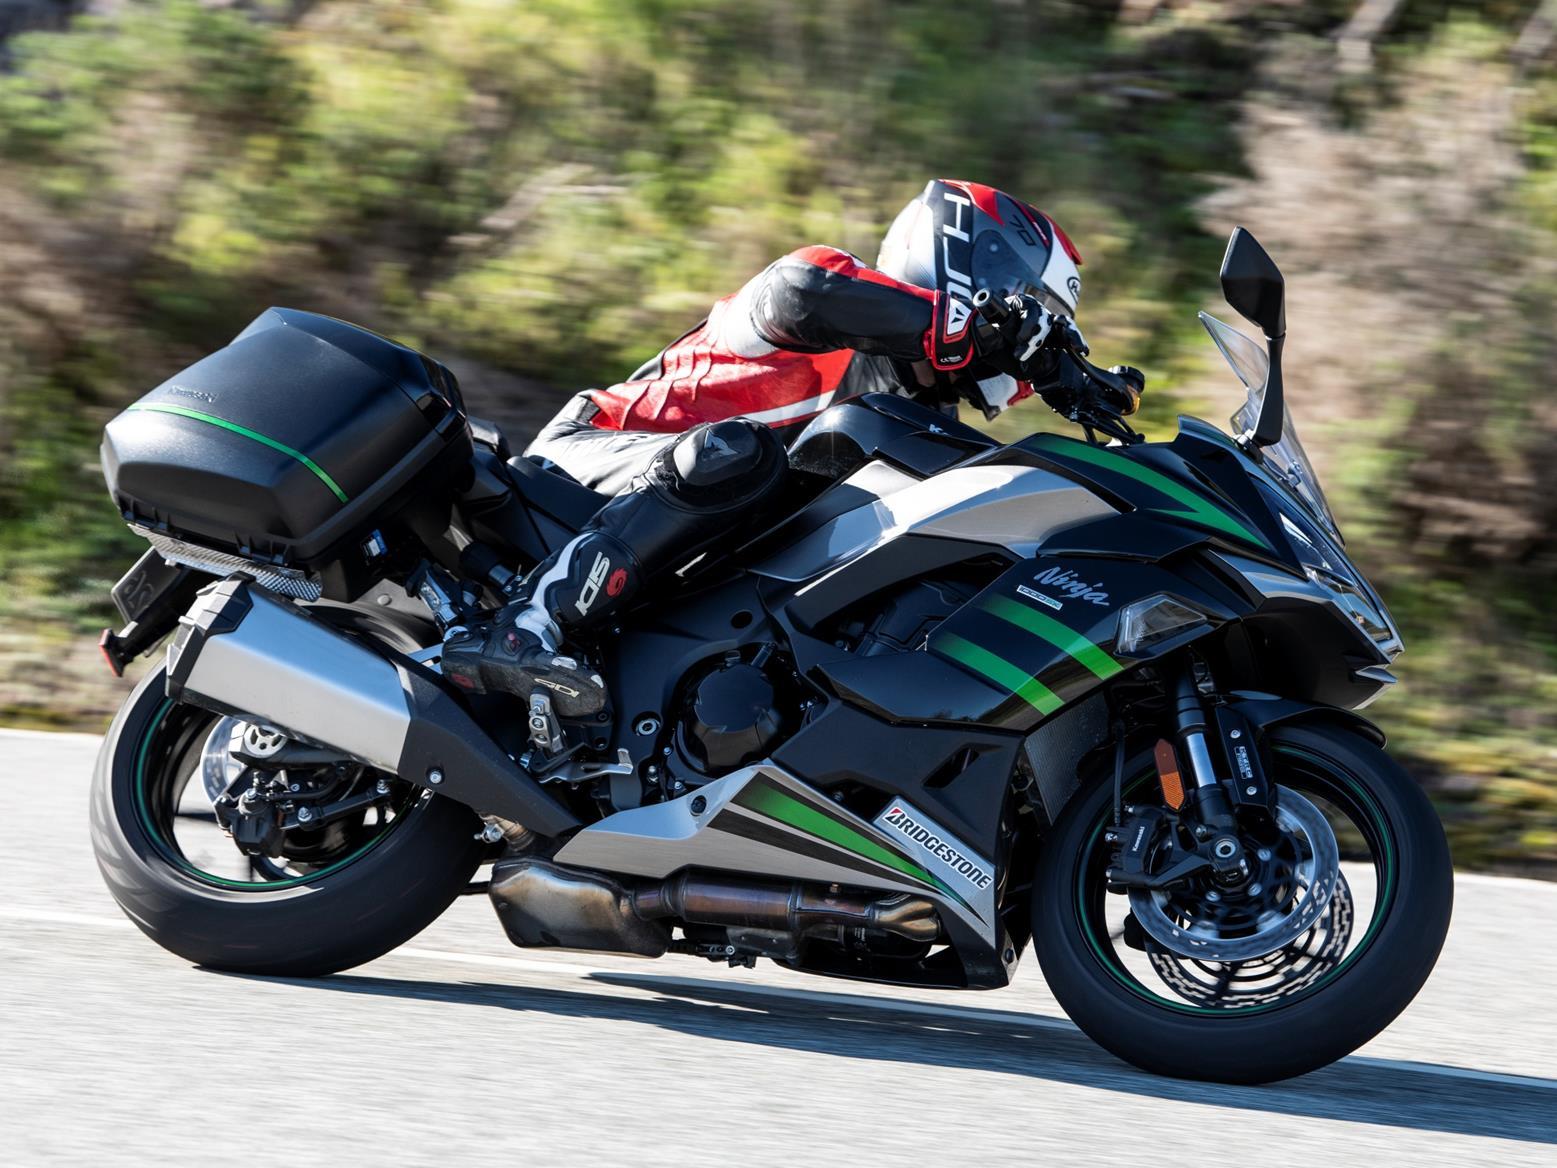 Kawasaki Ninja 1000SX right side